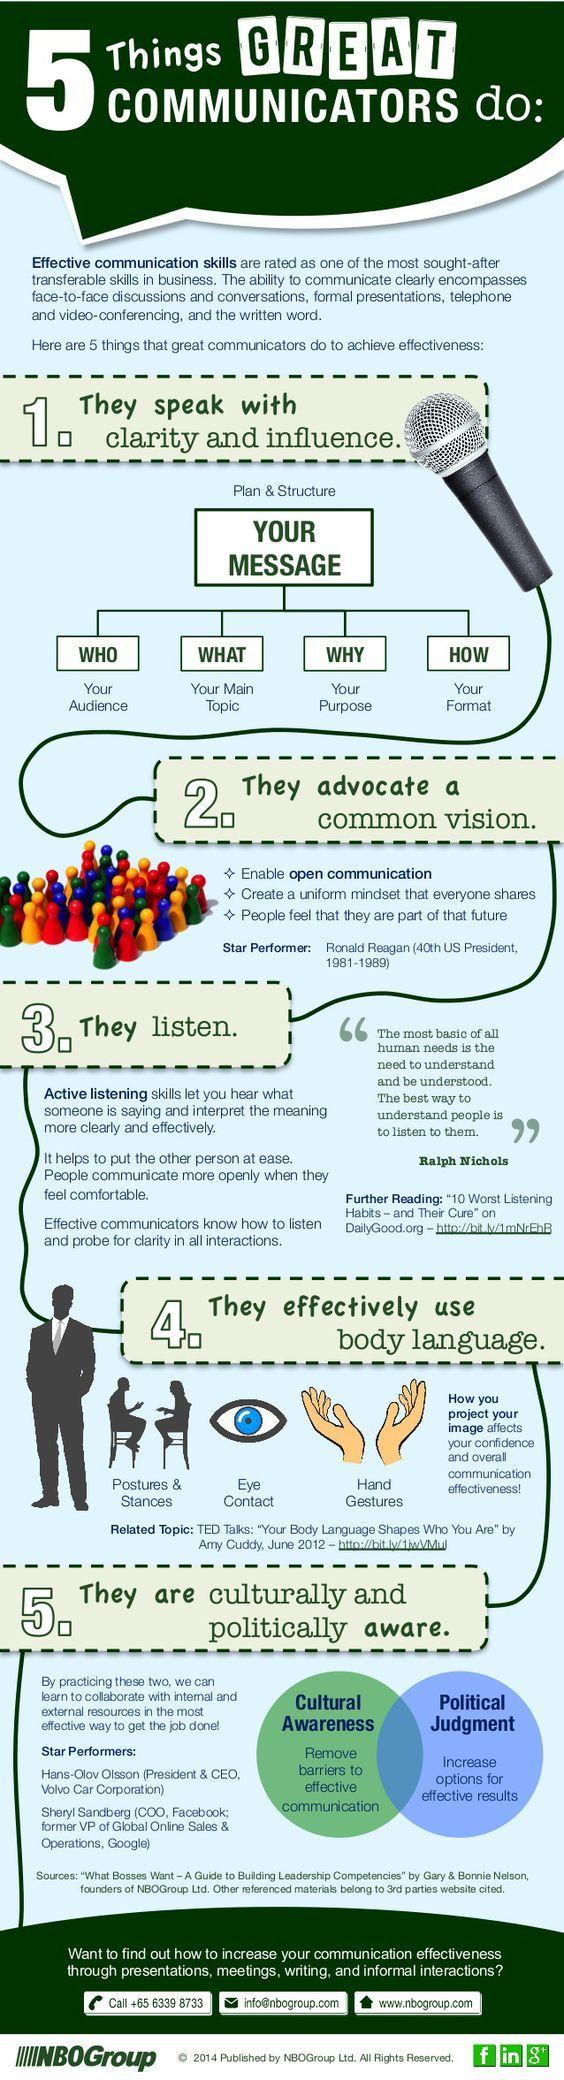 5 cosas que un gran comunicador hace #infografia #infographic #marketing